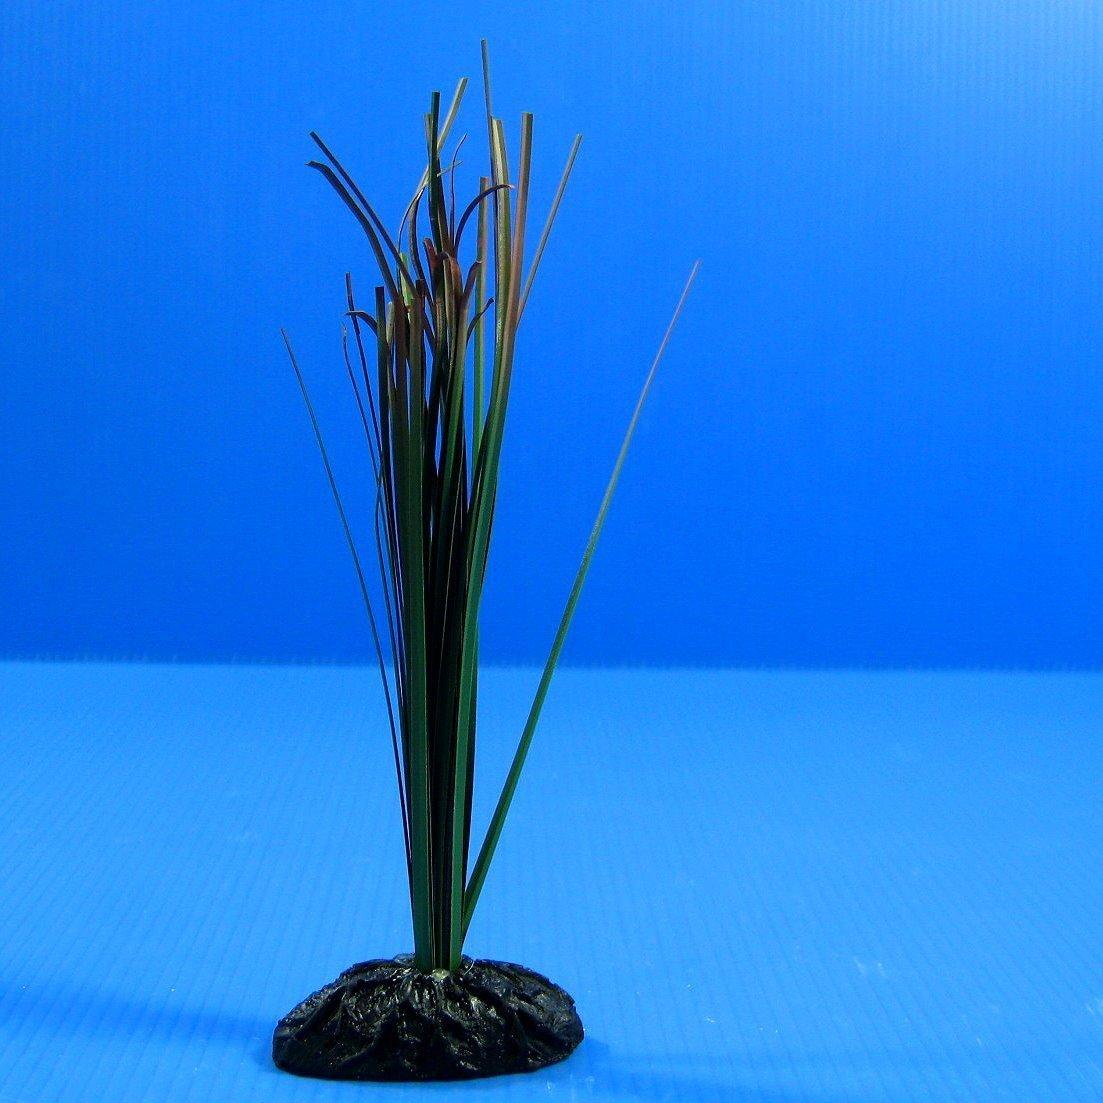 2 x水族館プラスチック植物16 cm – オーナメント装飾水プラント魚タンク# az98007 B011FUAKQM